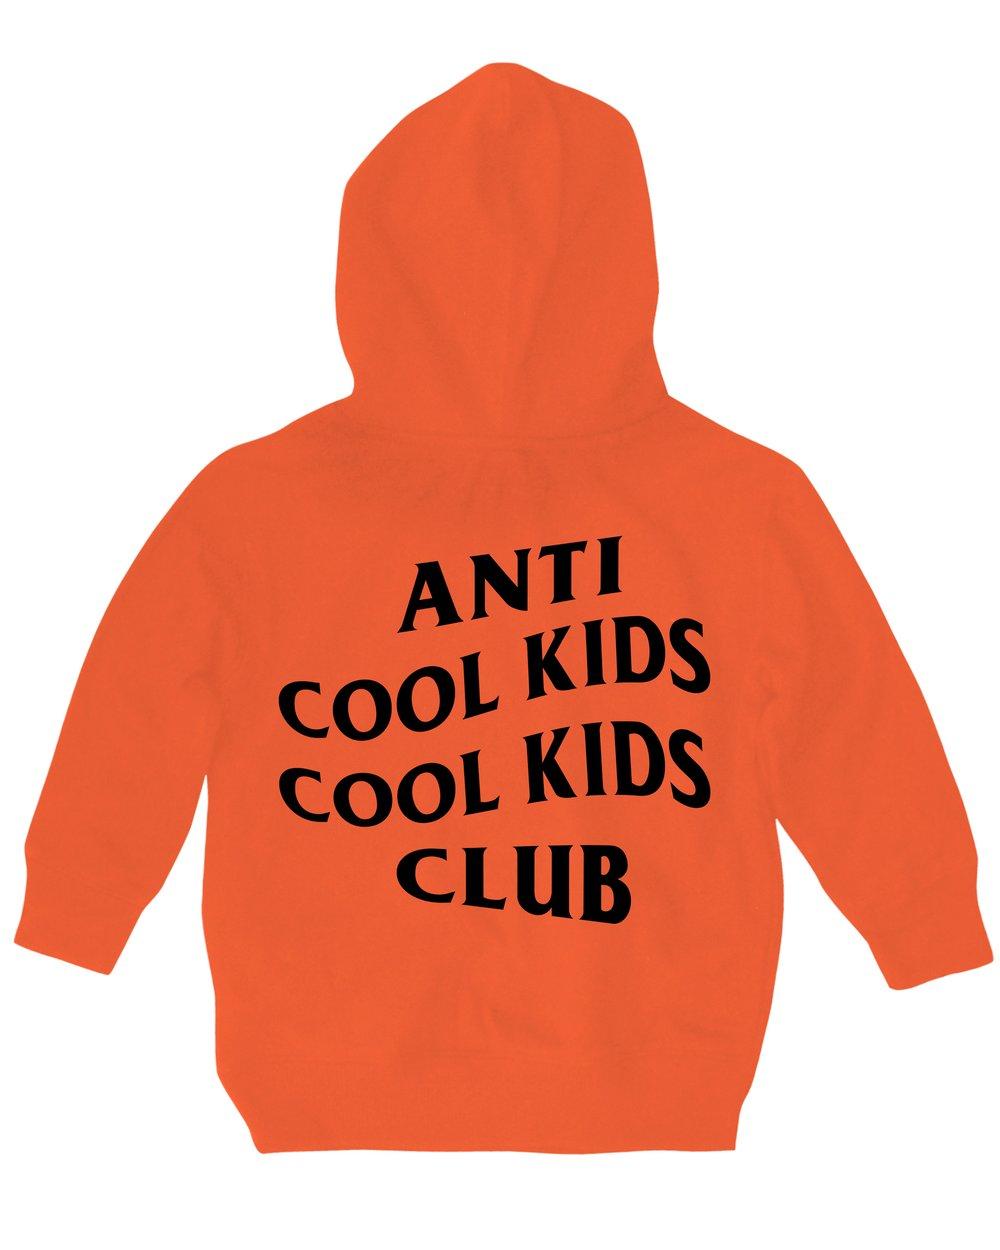 ANTI COOL KIDS HOODY ORANGE